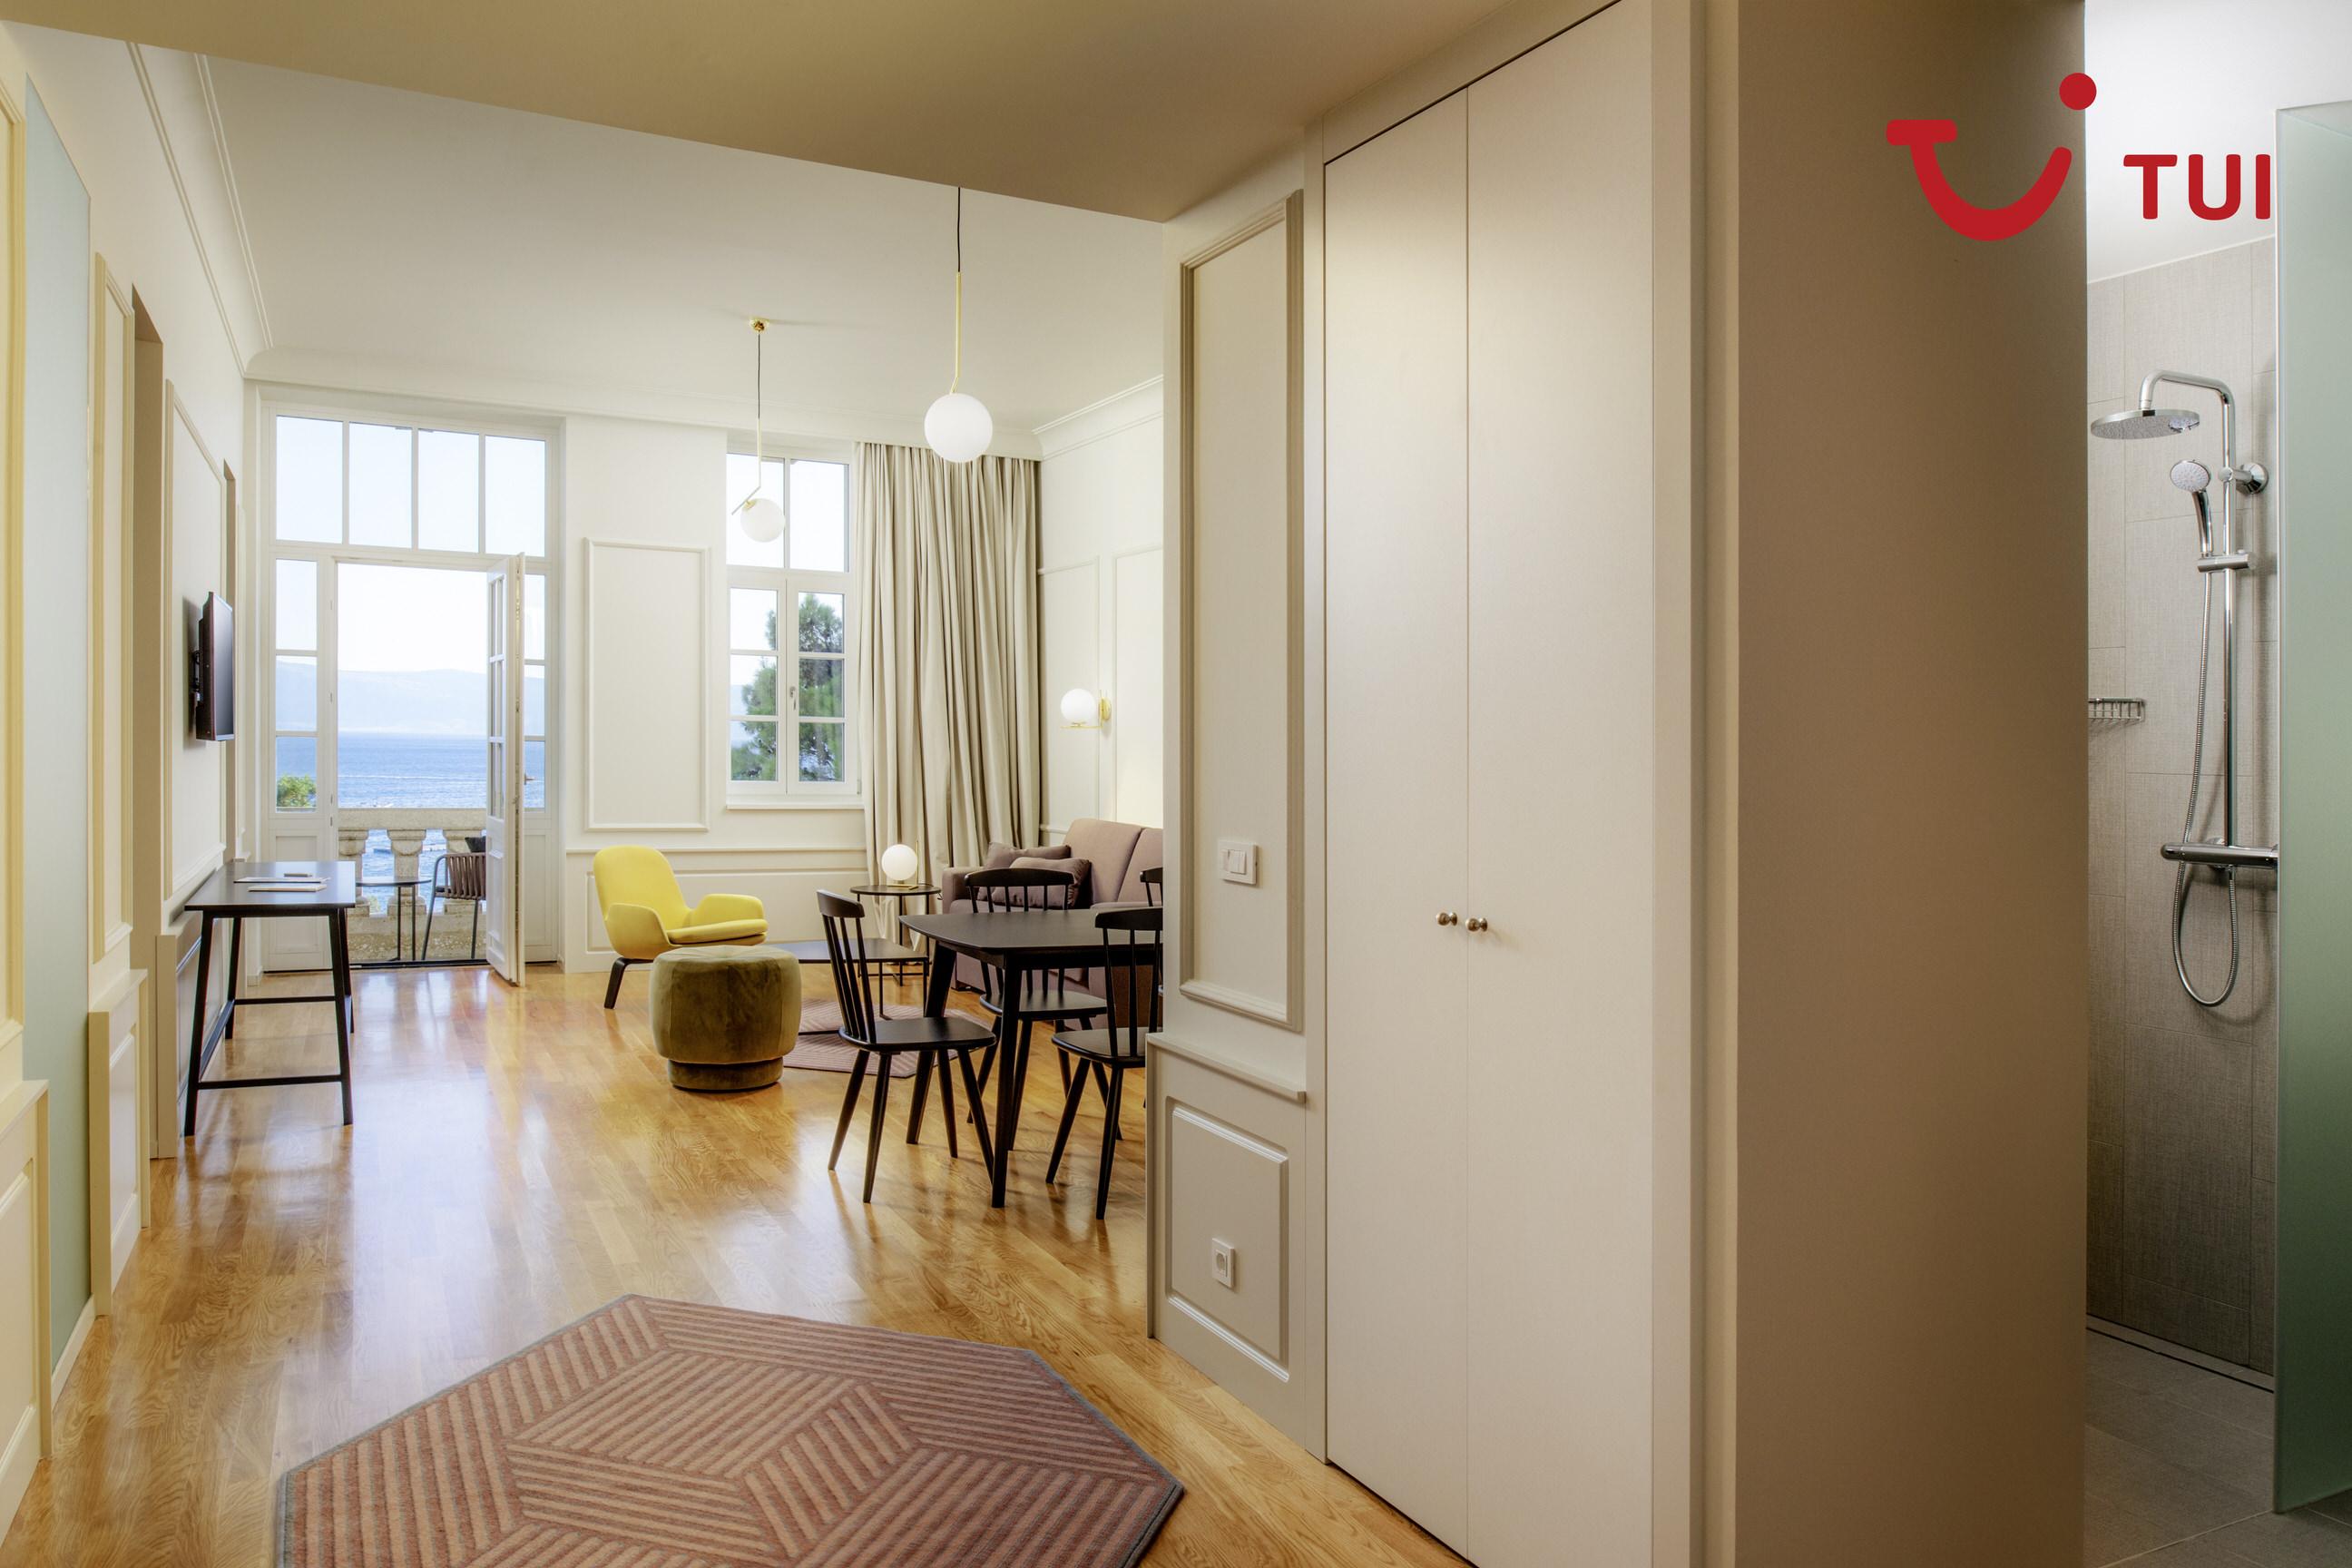 immobilienfotografen-berlin immobilienfotograf architekturfotograf berlin hotel fotograf interiorphotographer berlin 6